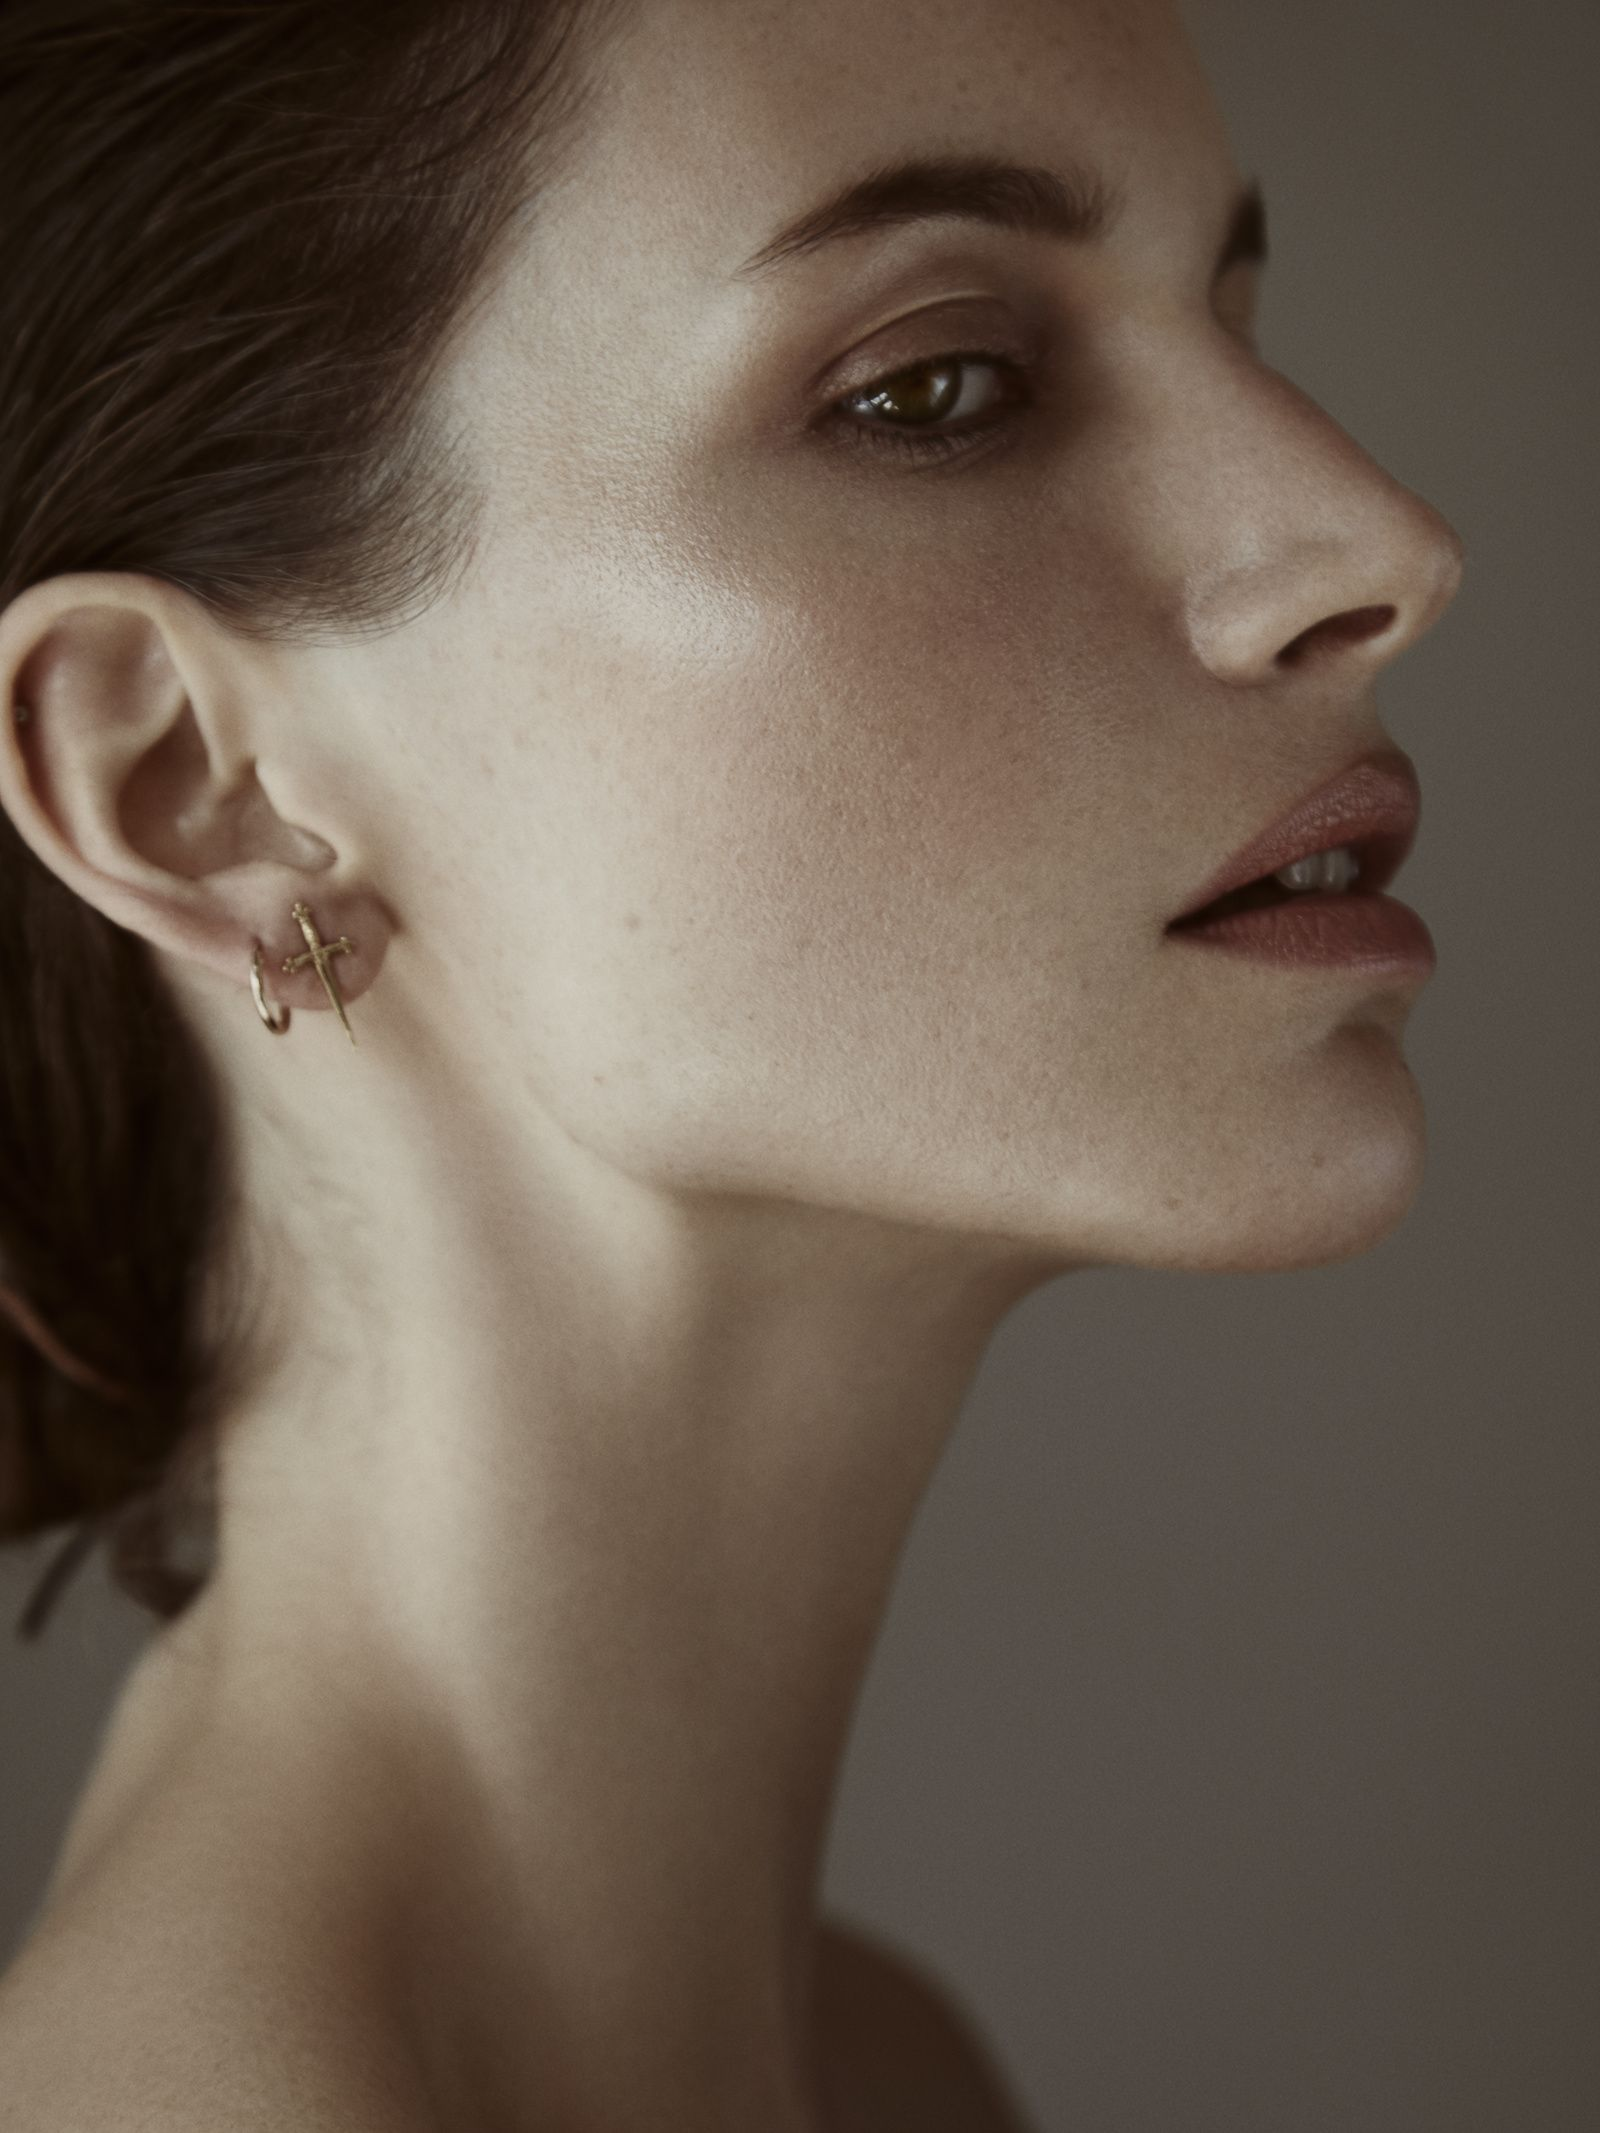 Claire Plekhoff / Makeup artist based in Paris - BEAUTY